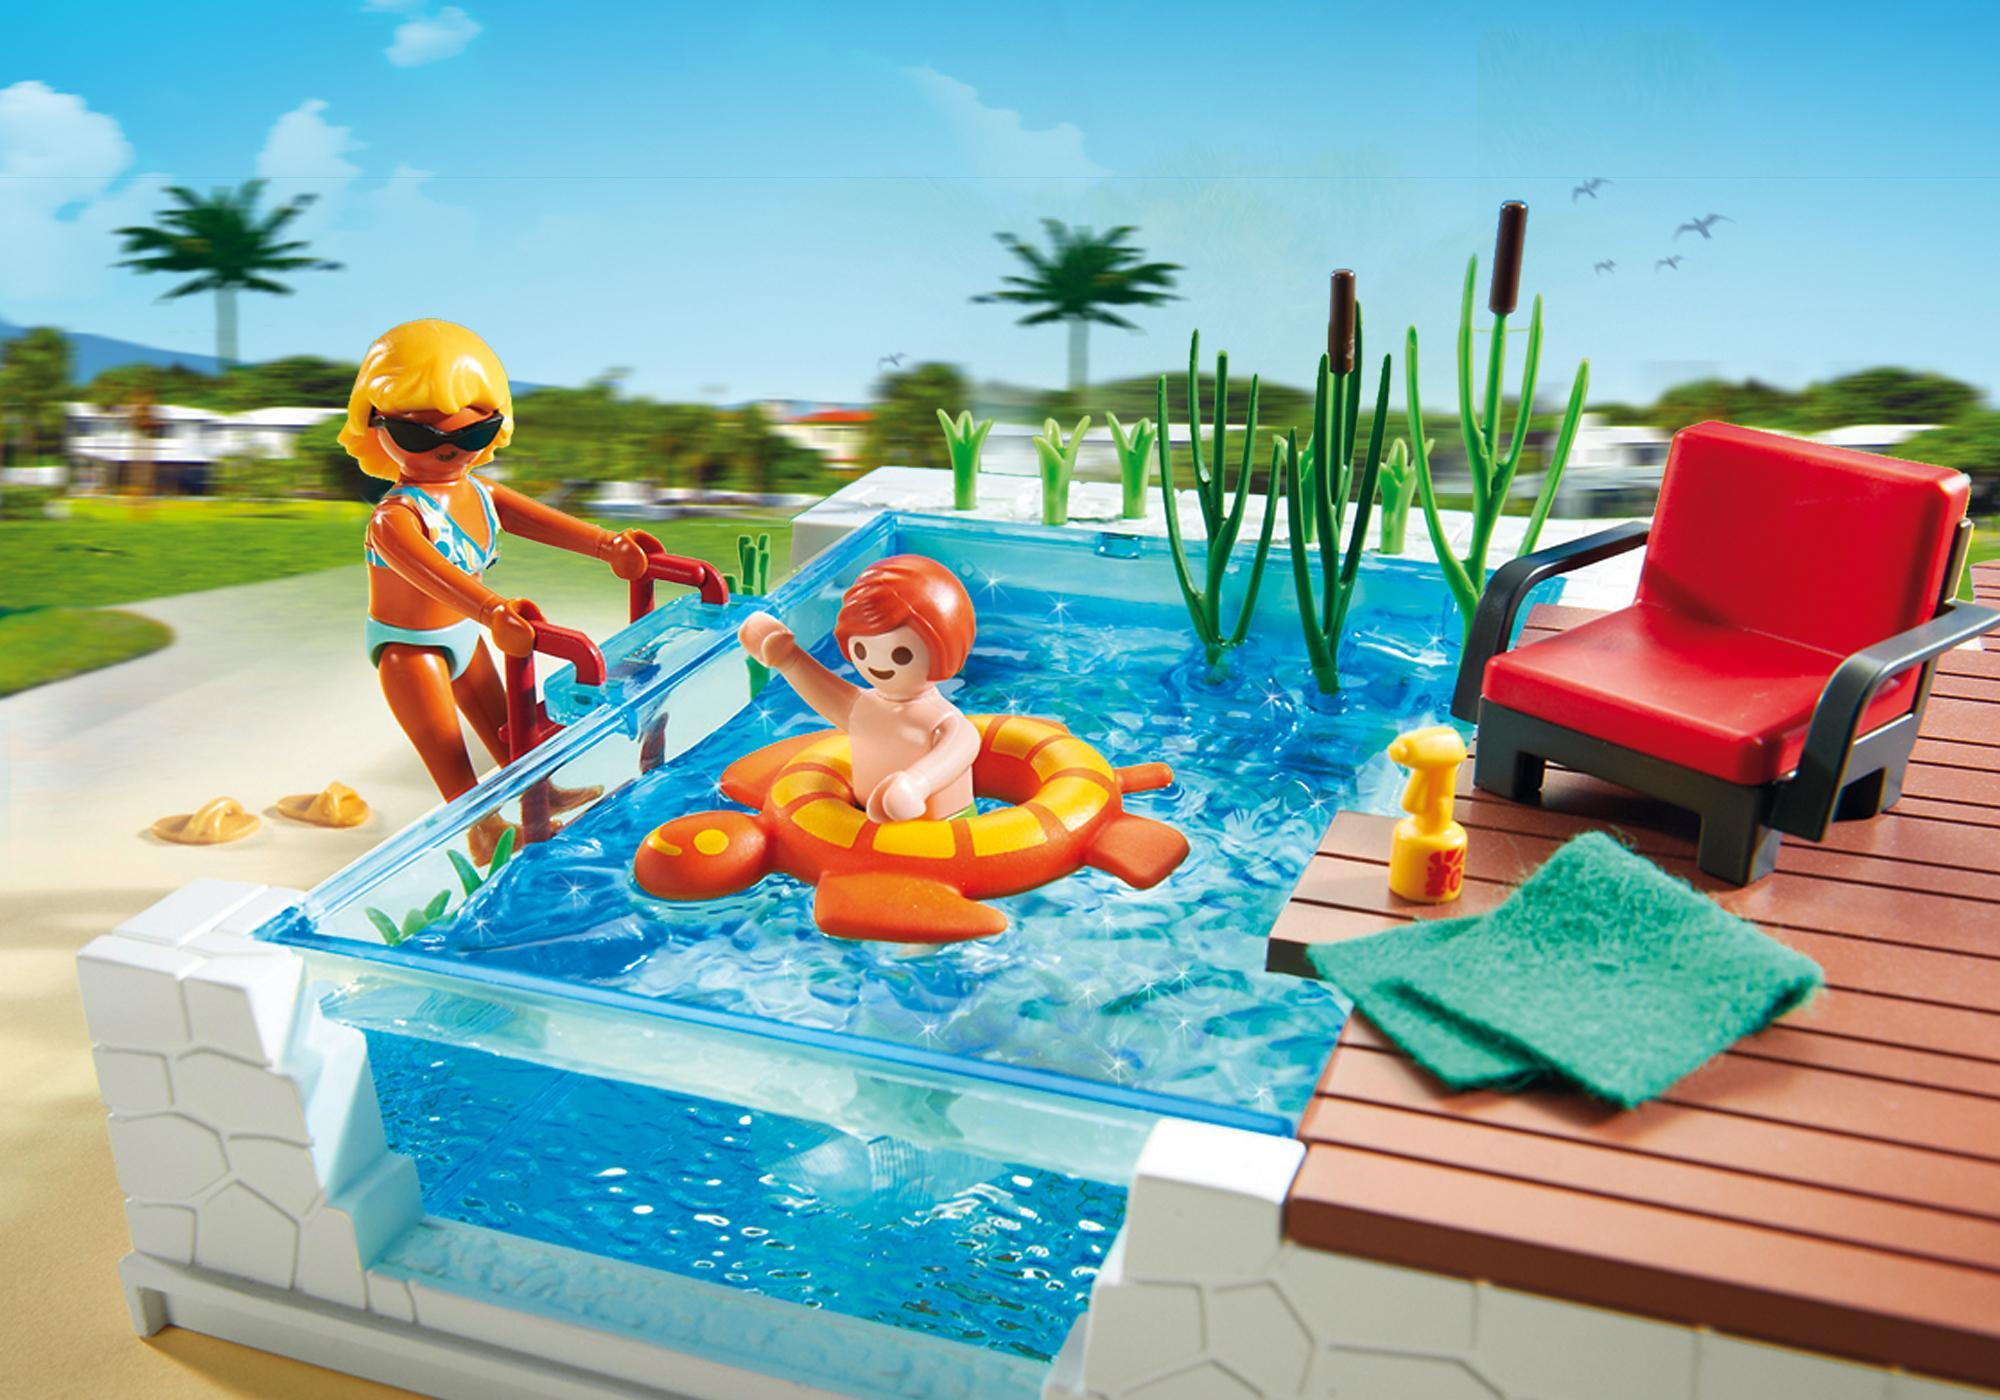 http://media.playmobil.com/i/playmobil/5575_product_extra1/Einbau-Swimmingpool